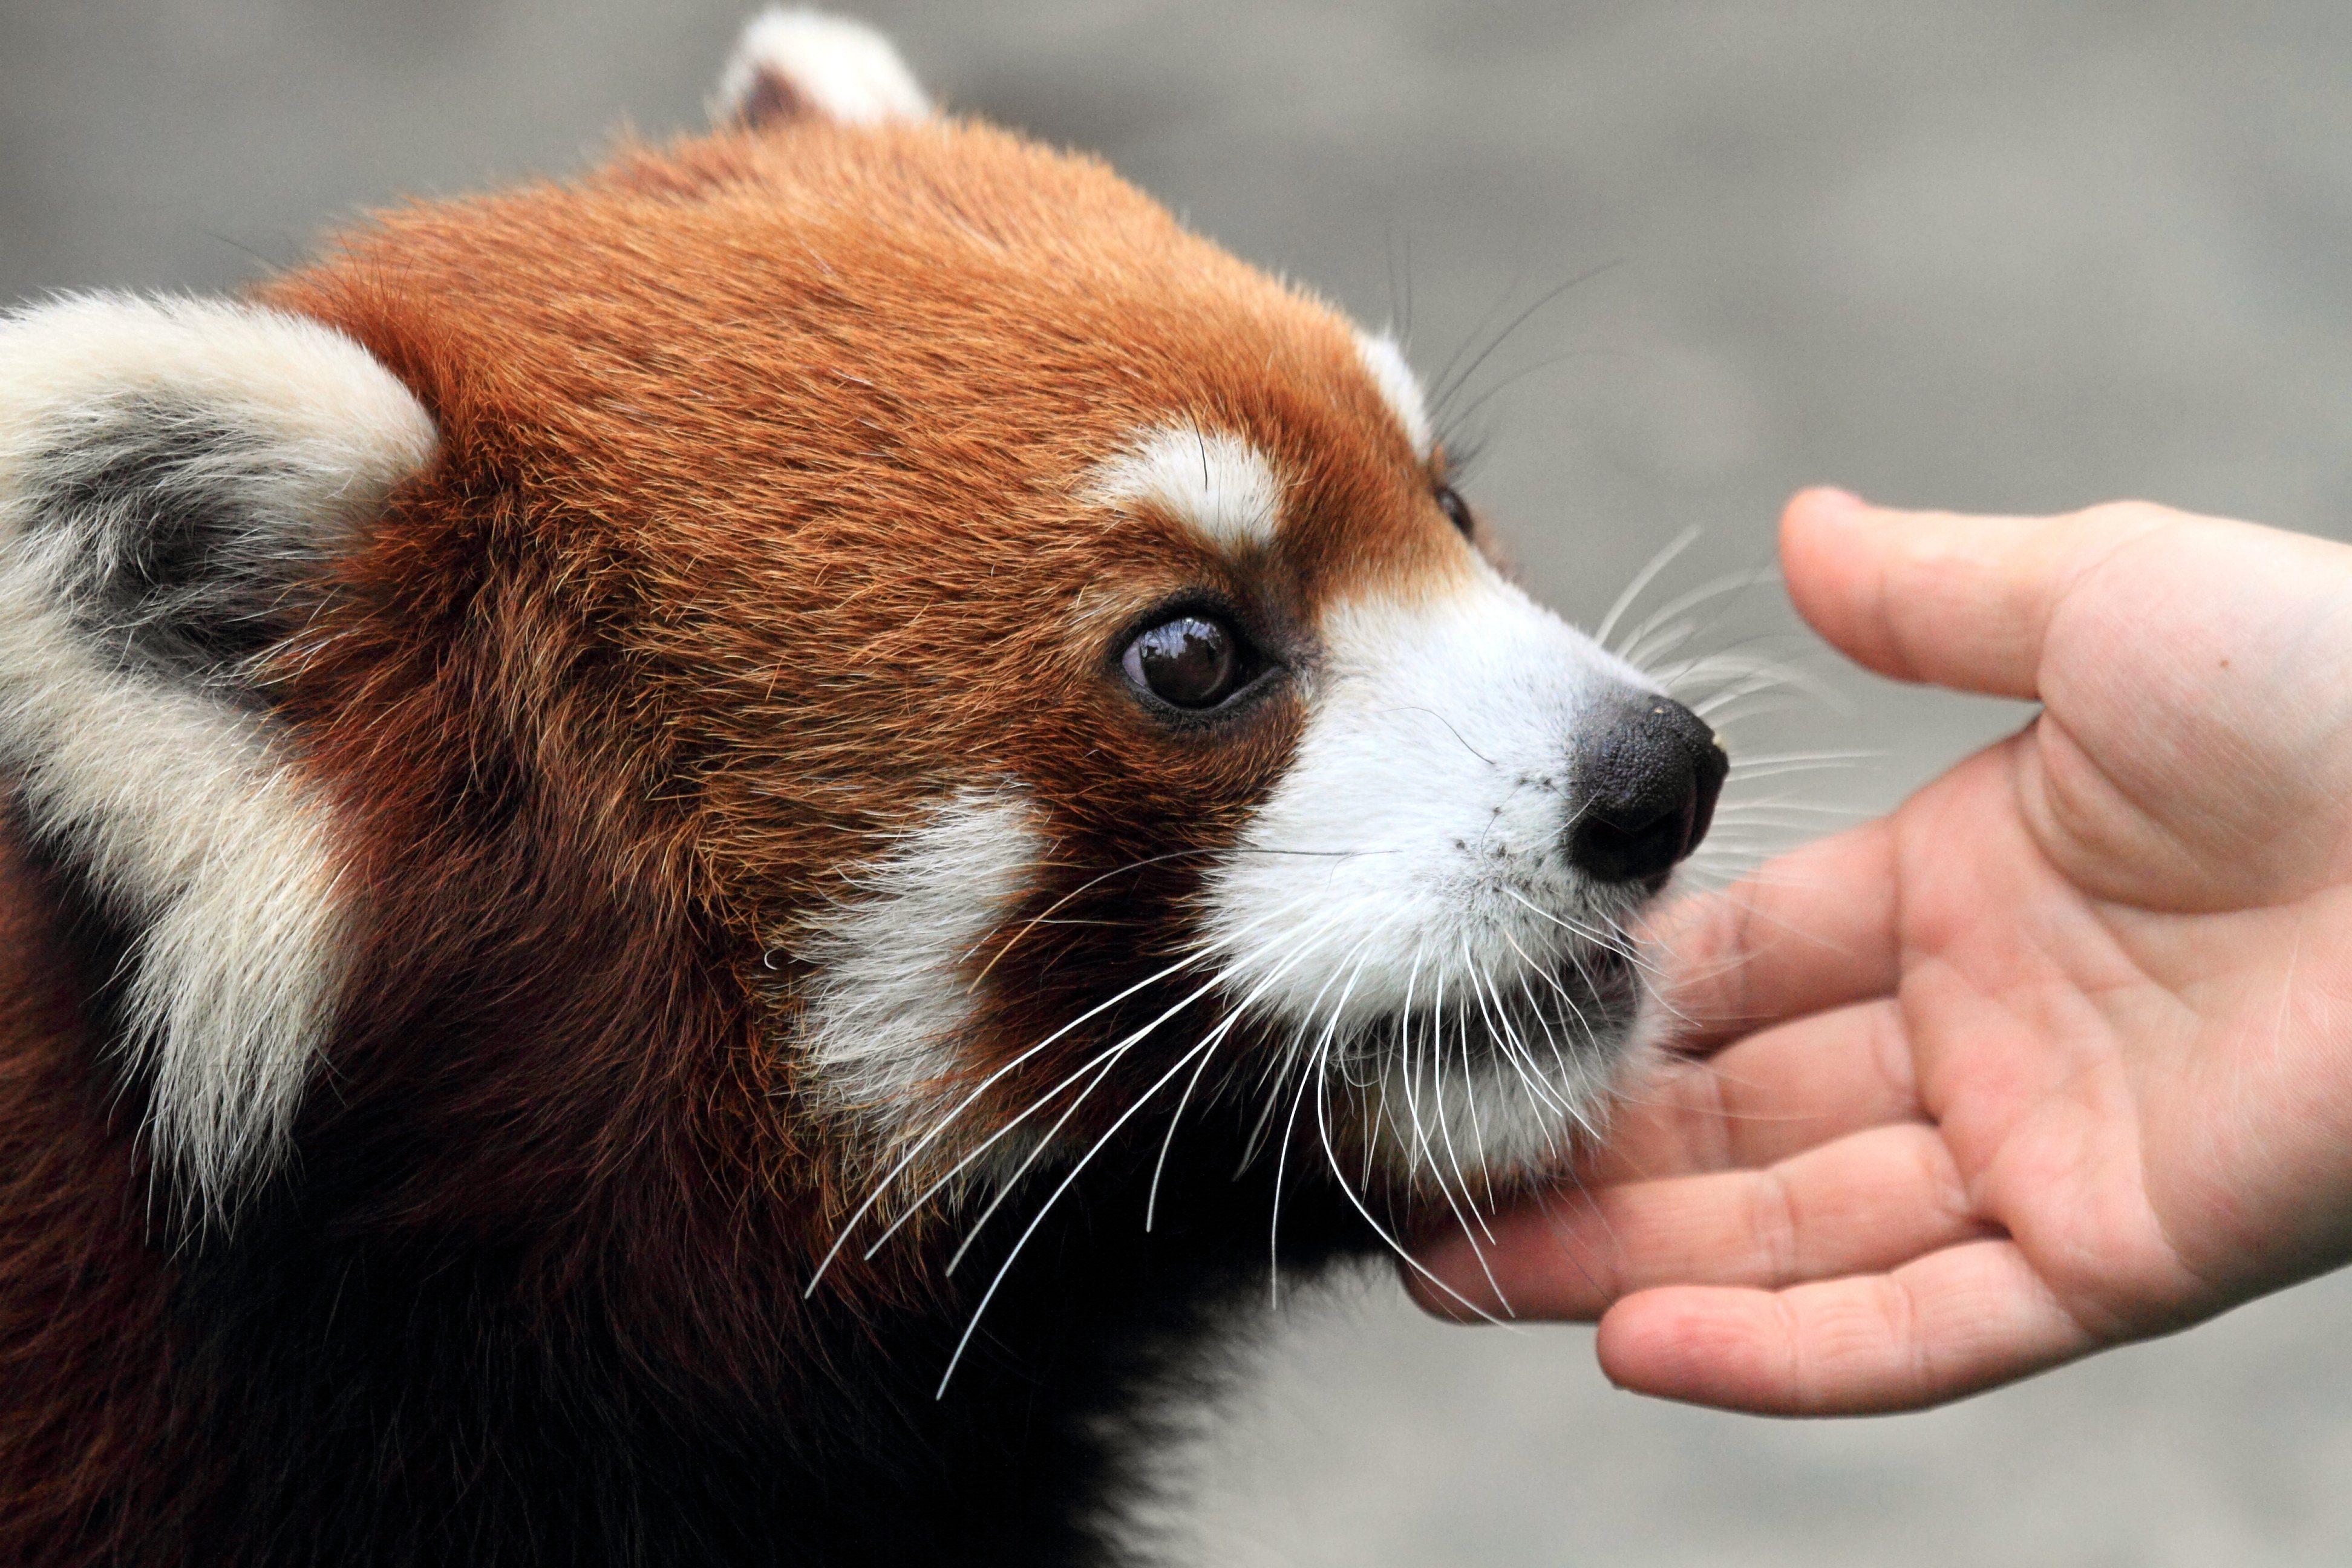 lovely red panda enjoying gentle human touch